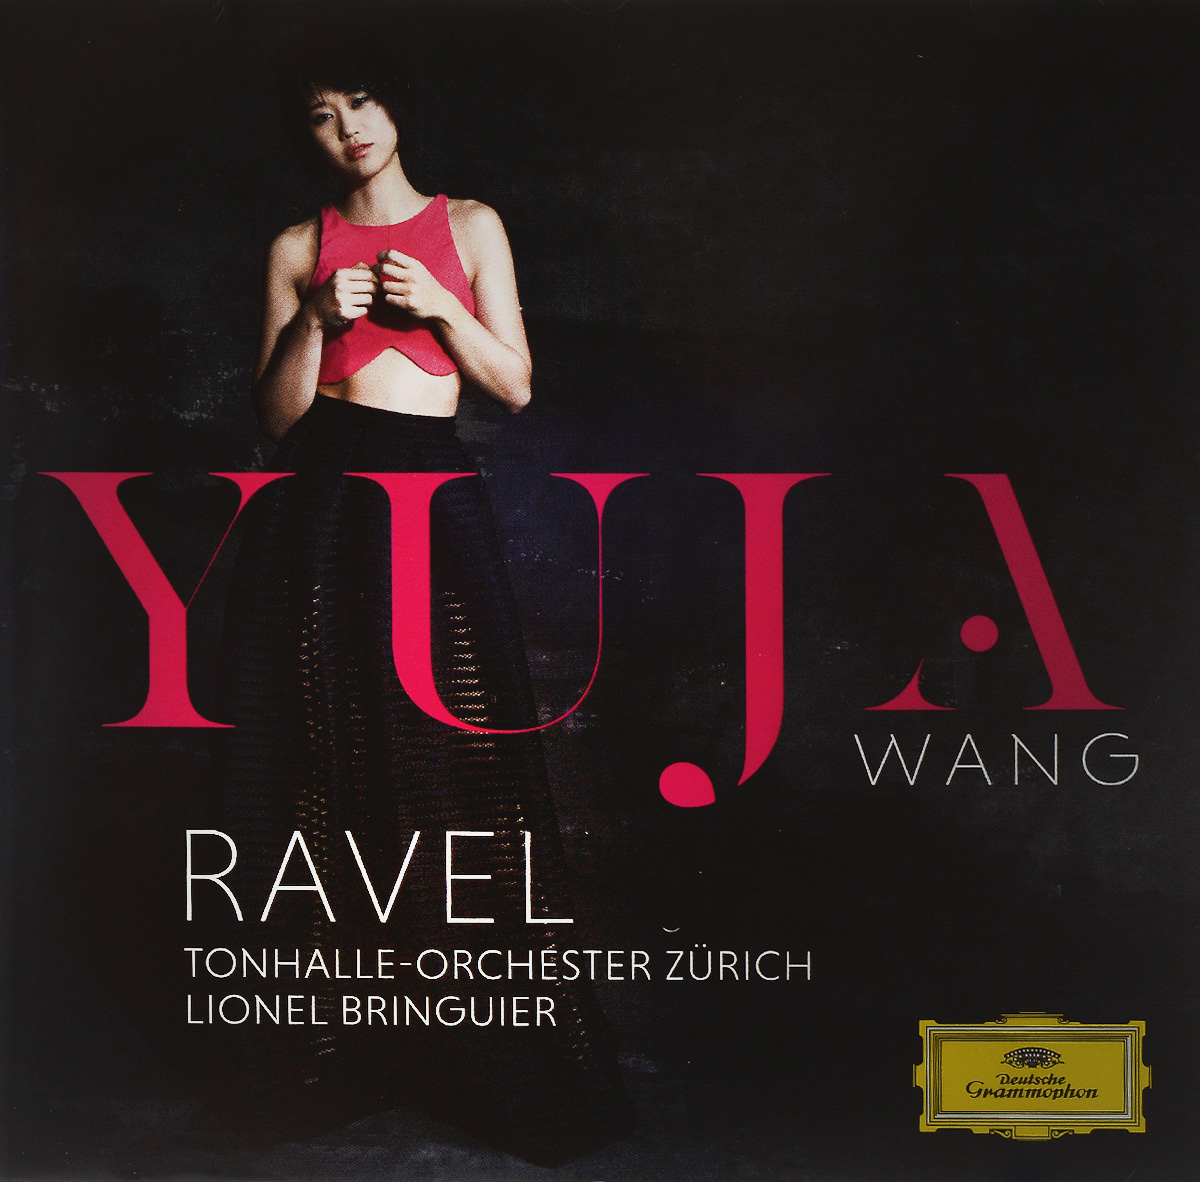 Ван Юйцзя,Tonhalle-Orchester Zurich,Лионель Бренгье Yuja Wang. Ravel